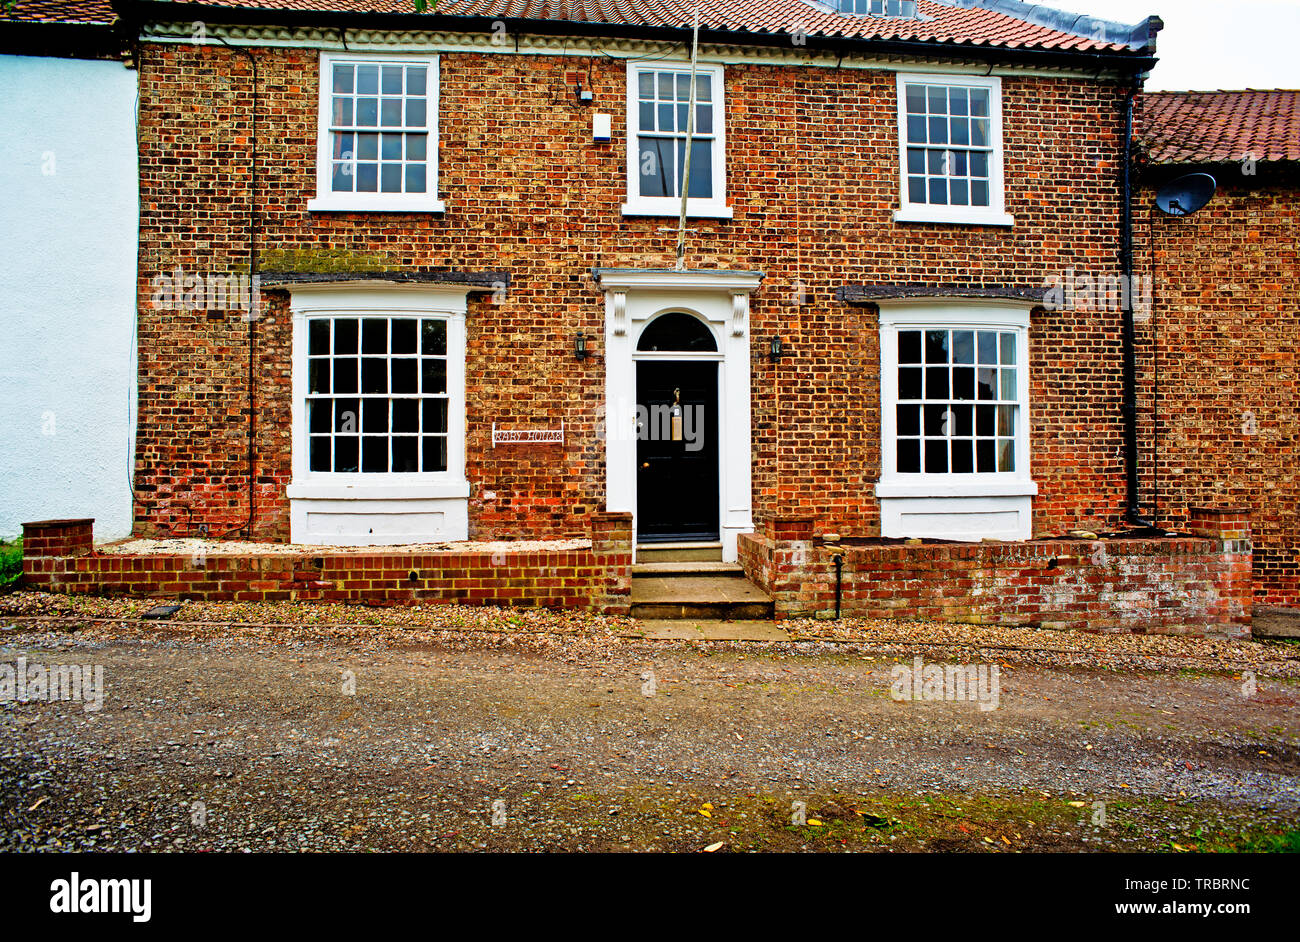 Raby House, Chapel Row, Sadberge, Borough of Darlington, England Stock Photo